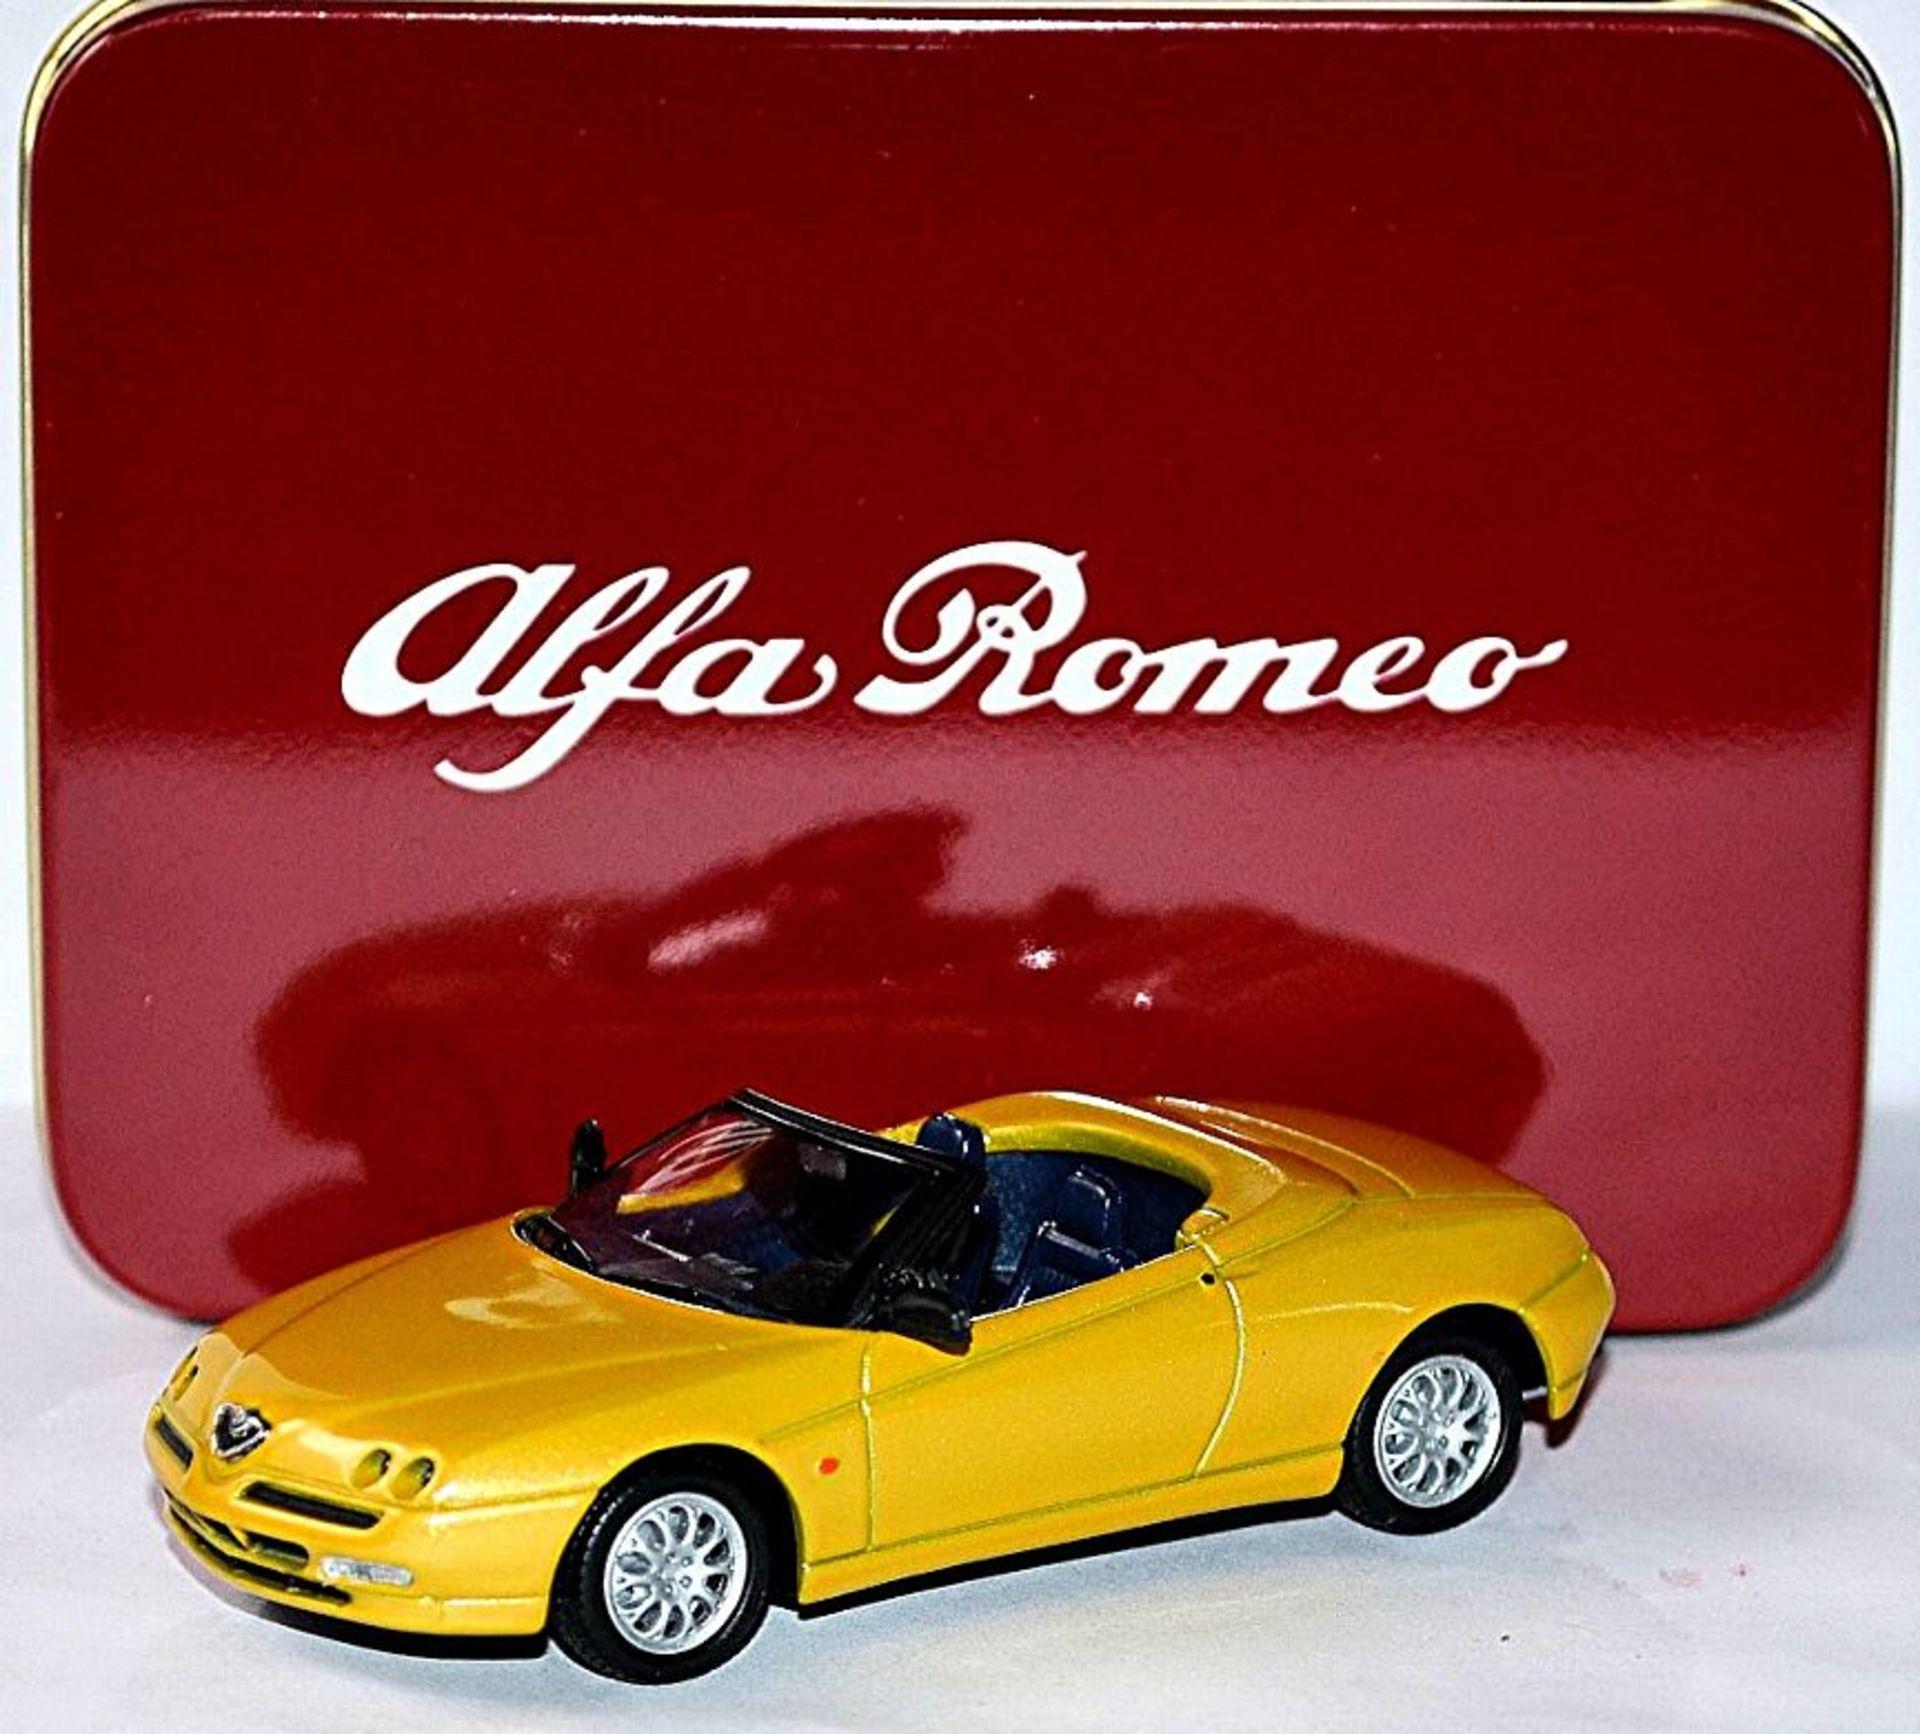 Lot 10377 - V Brand New 1/43 Diecast Model 4655 - 1995 Alfa Romeo Spider - eBay Price £15.99